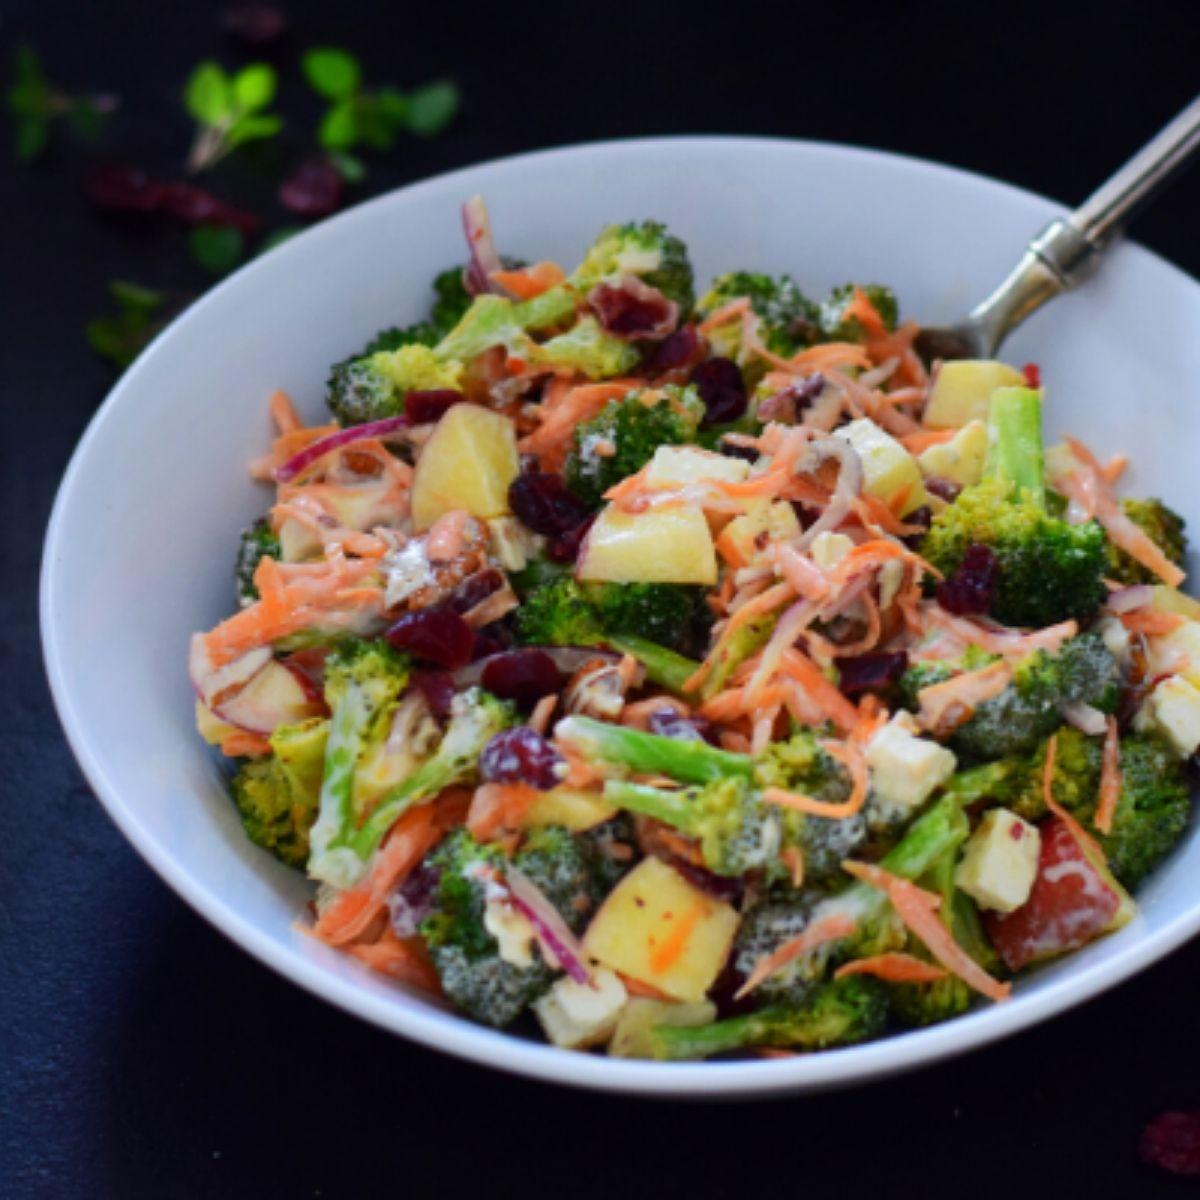 Roasted Broccoli, Feta and Cranberry Salad